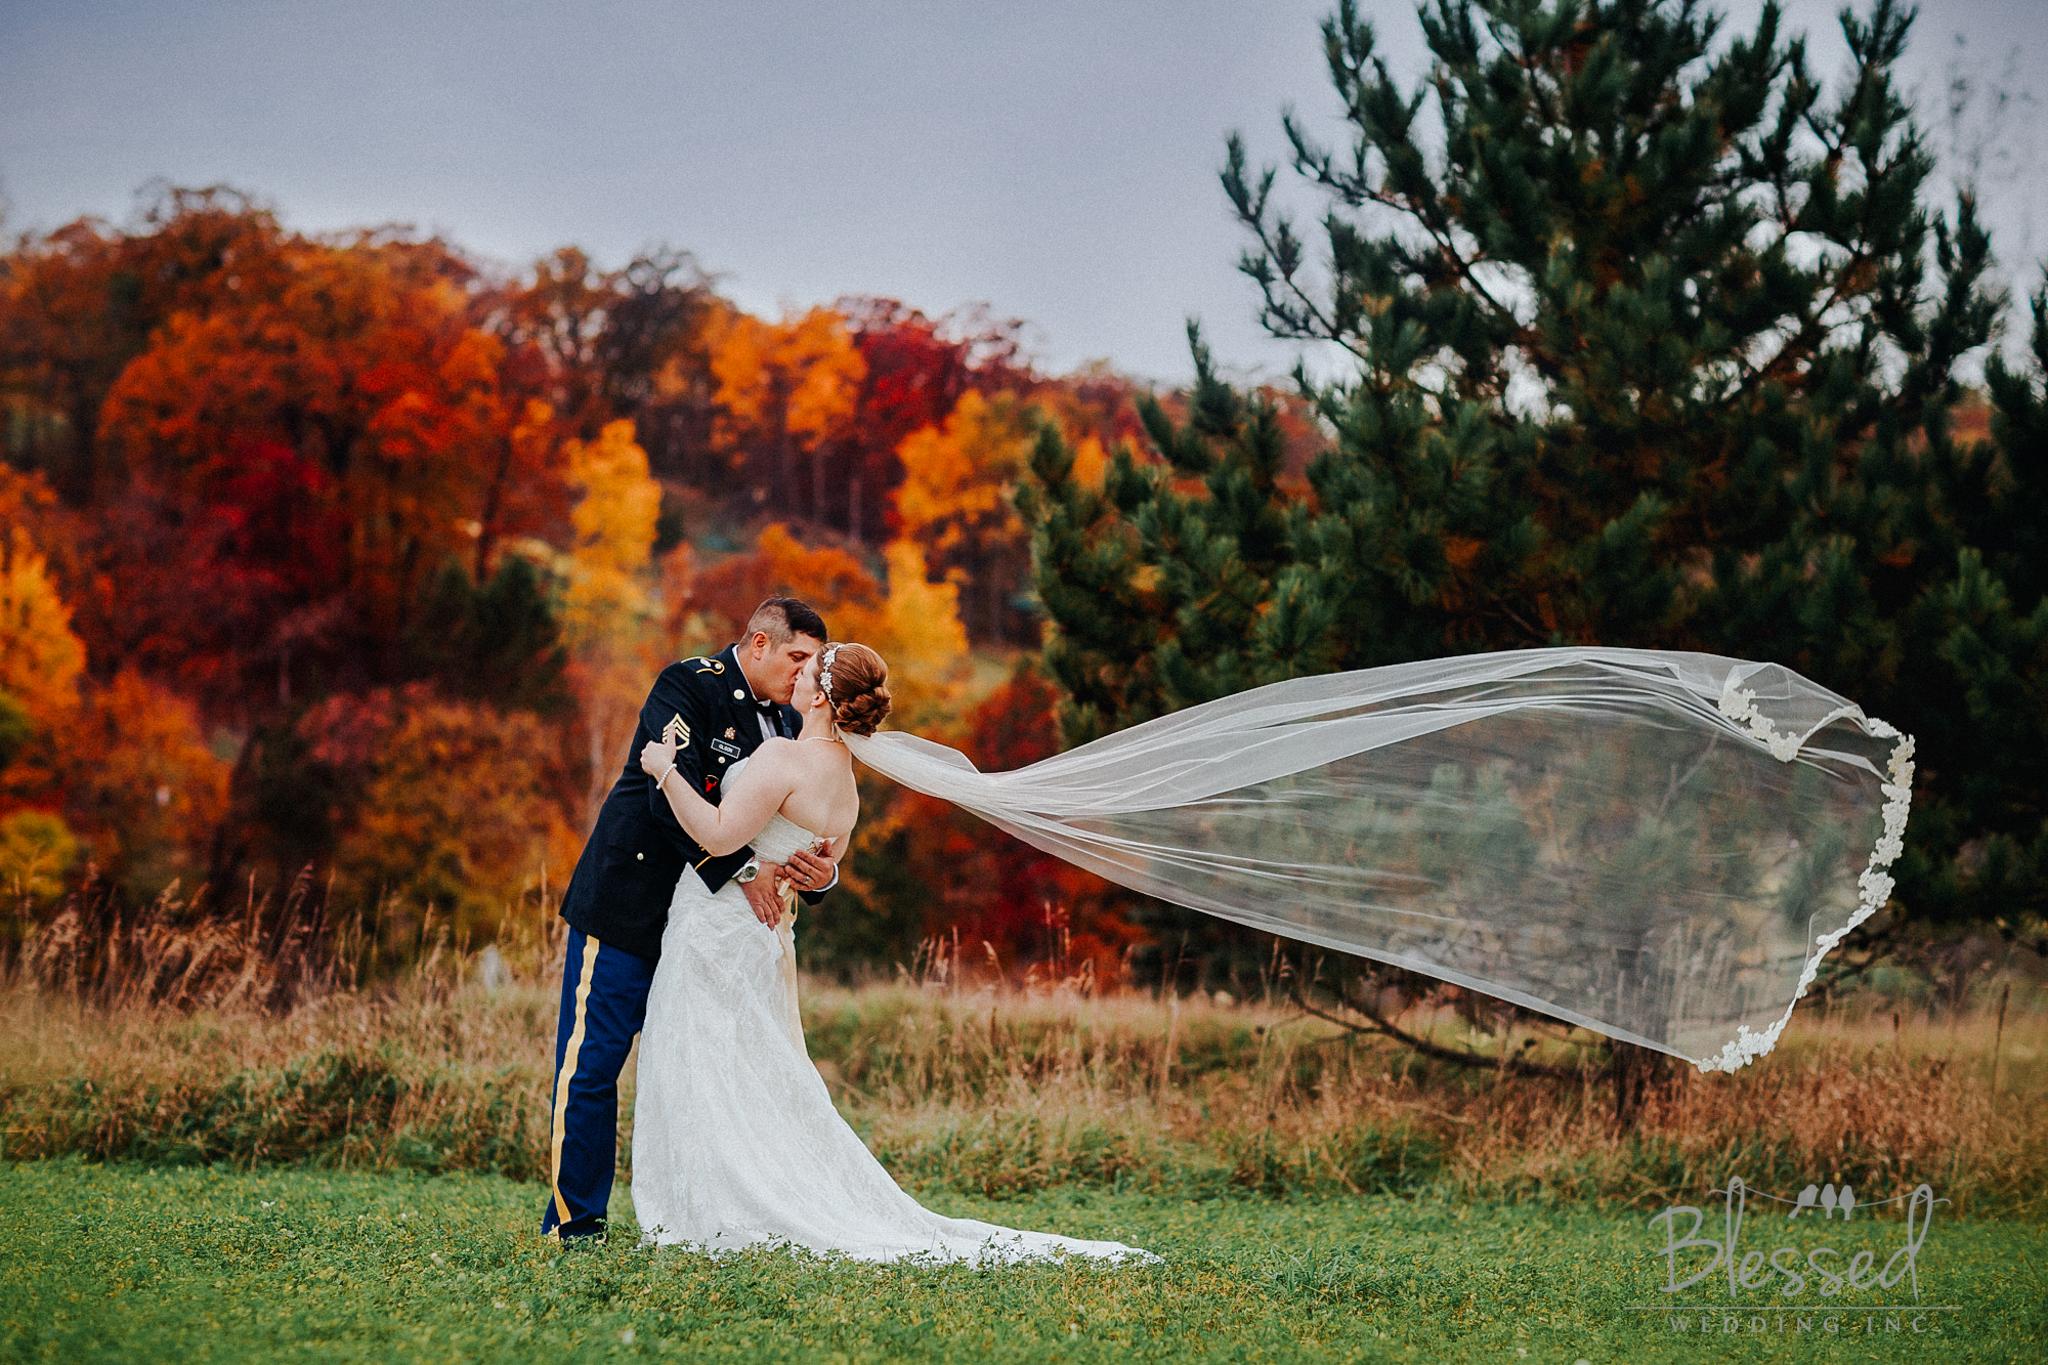 Destination Wedding Photography Minnesota By Blessed Wedding Photographers-54.jpg